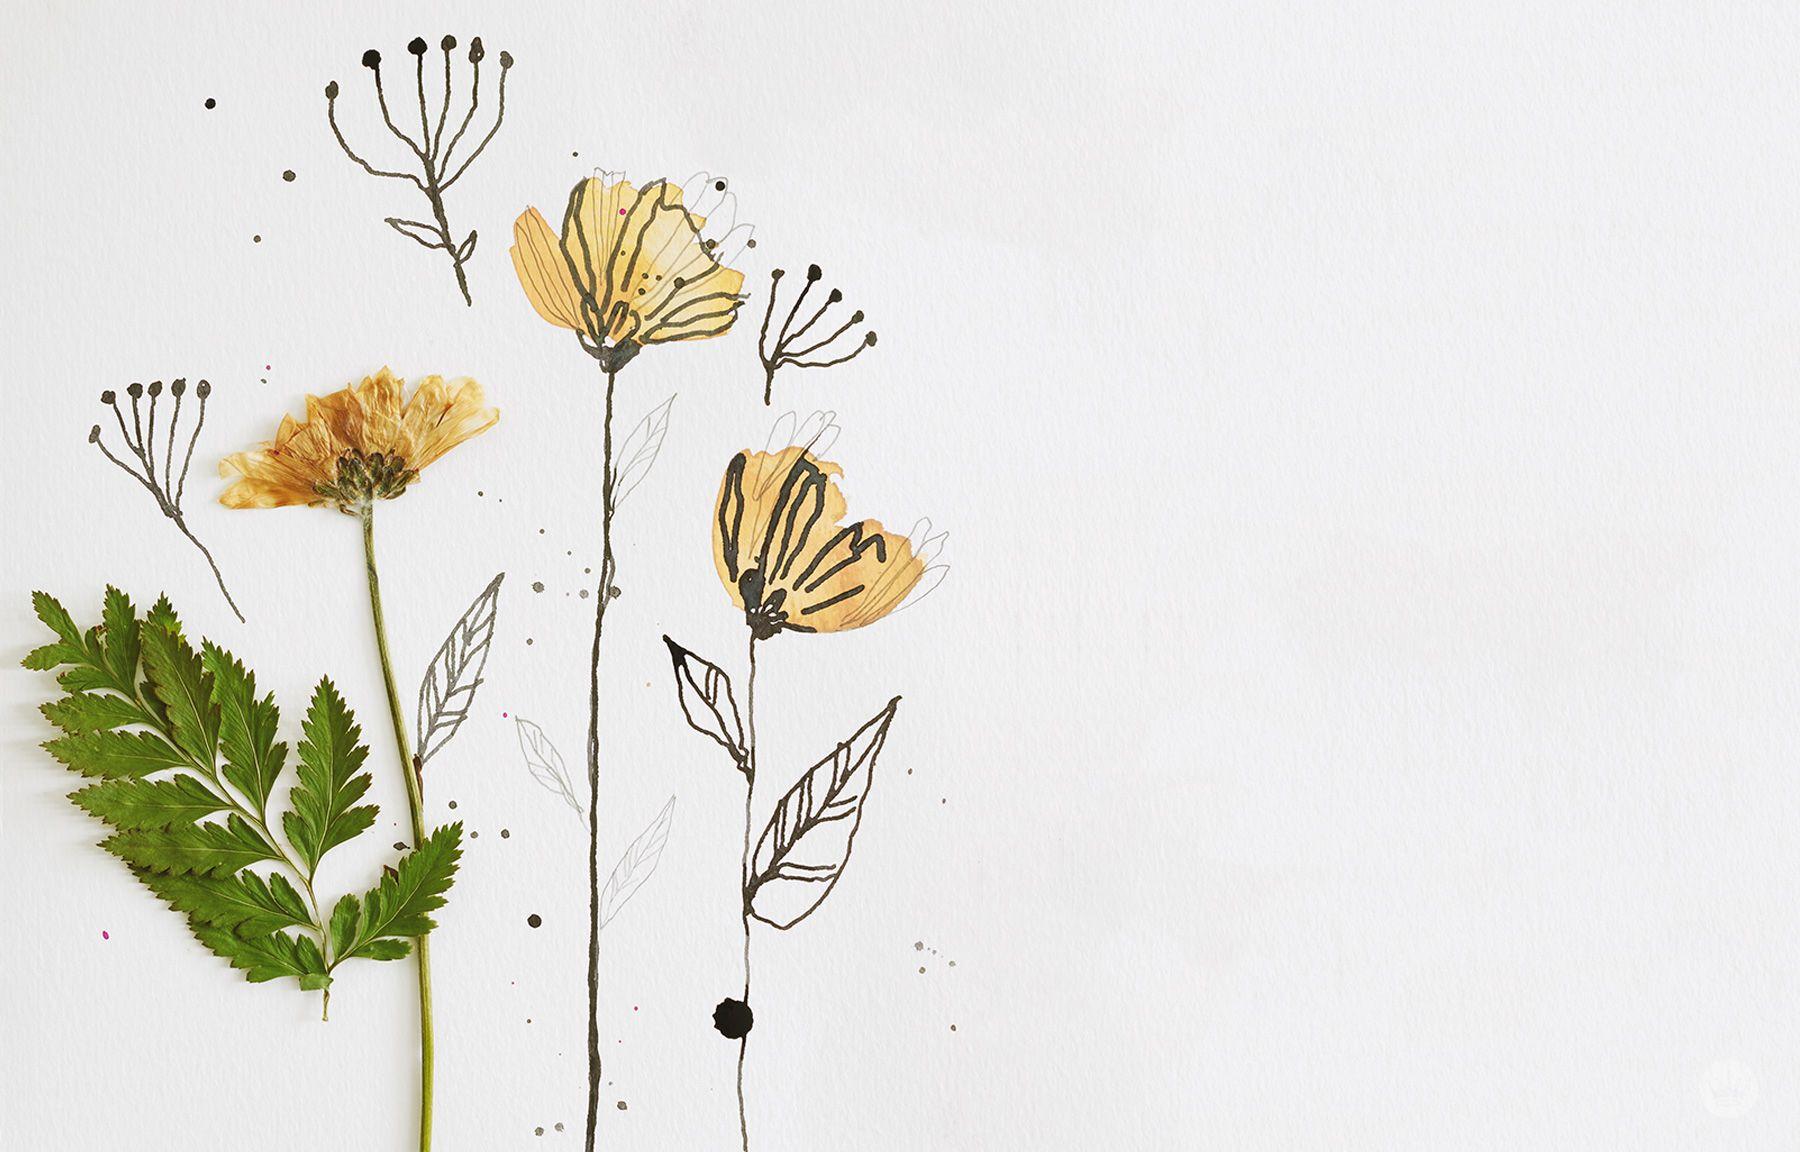 Minimalist Wallpaper For Macbook Air , HD Wallpaper & Backgrounds